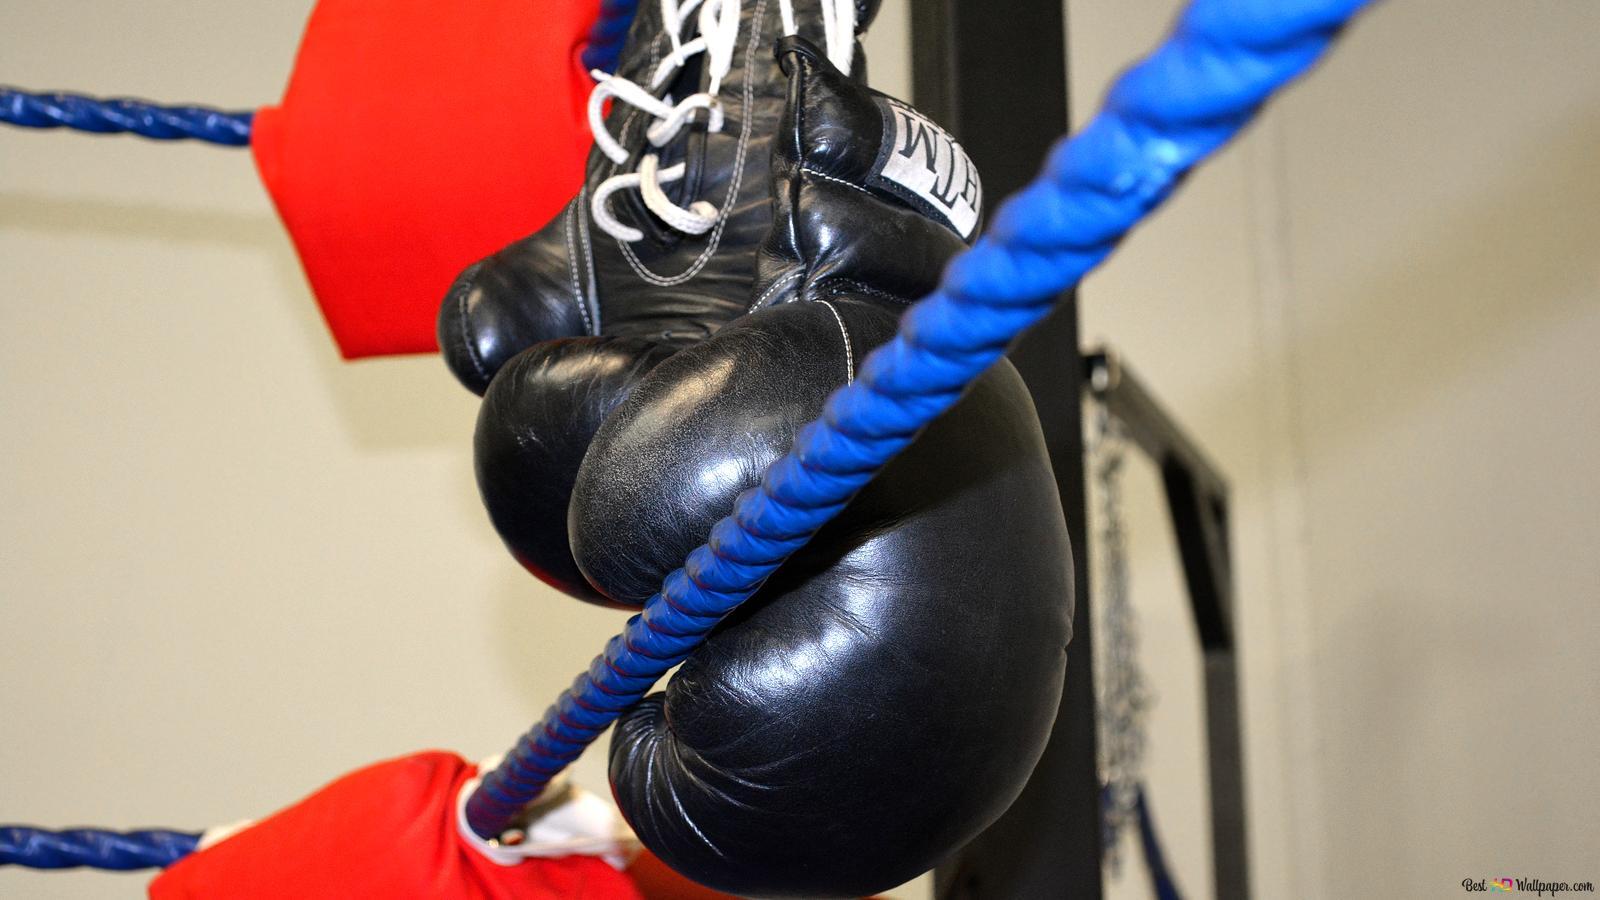 Black Boxing Gloves Hd Wallpaper Download